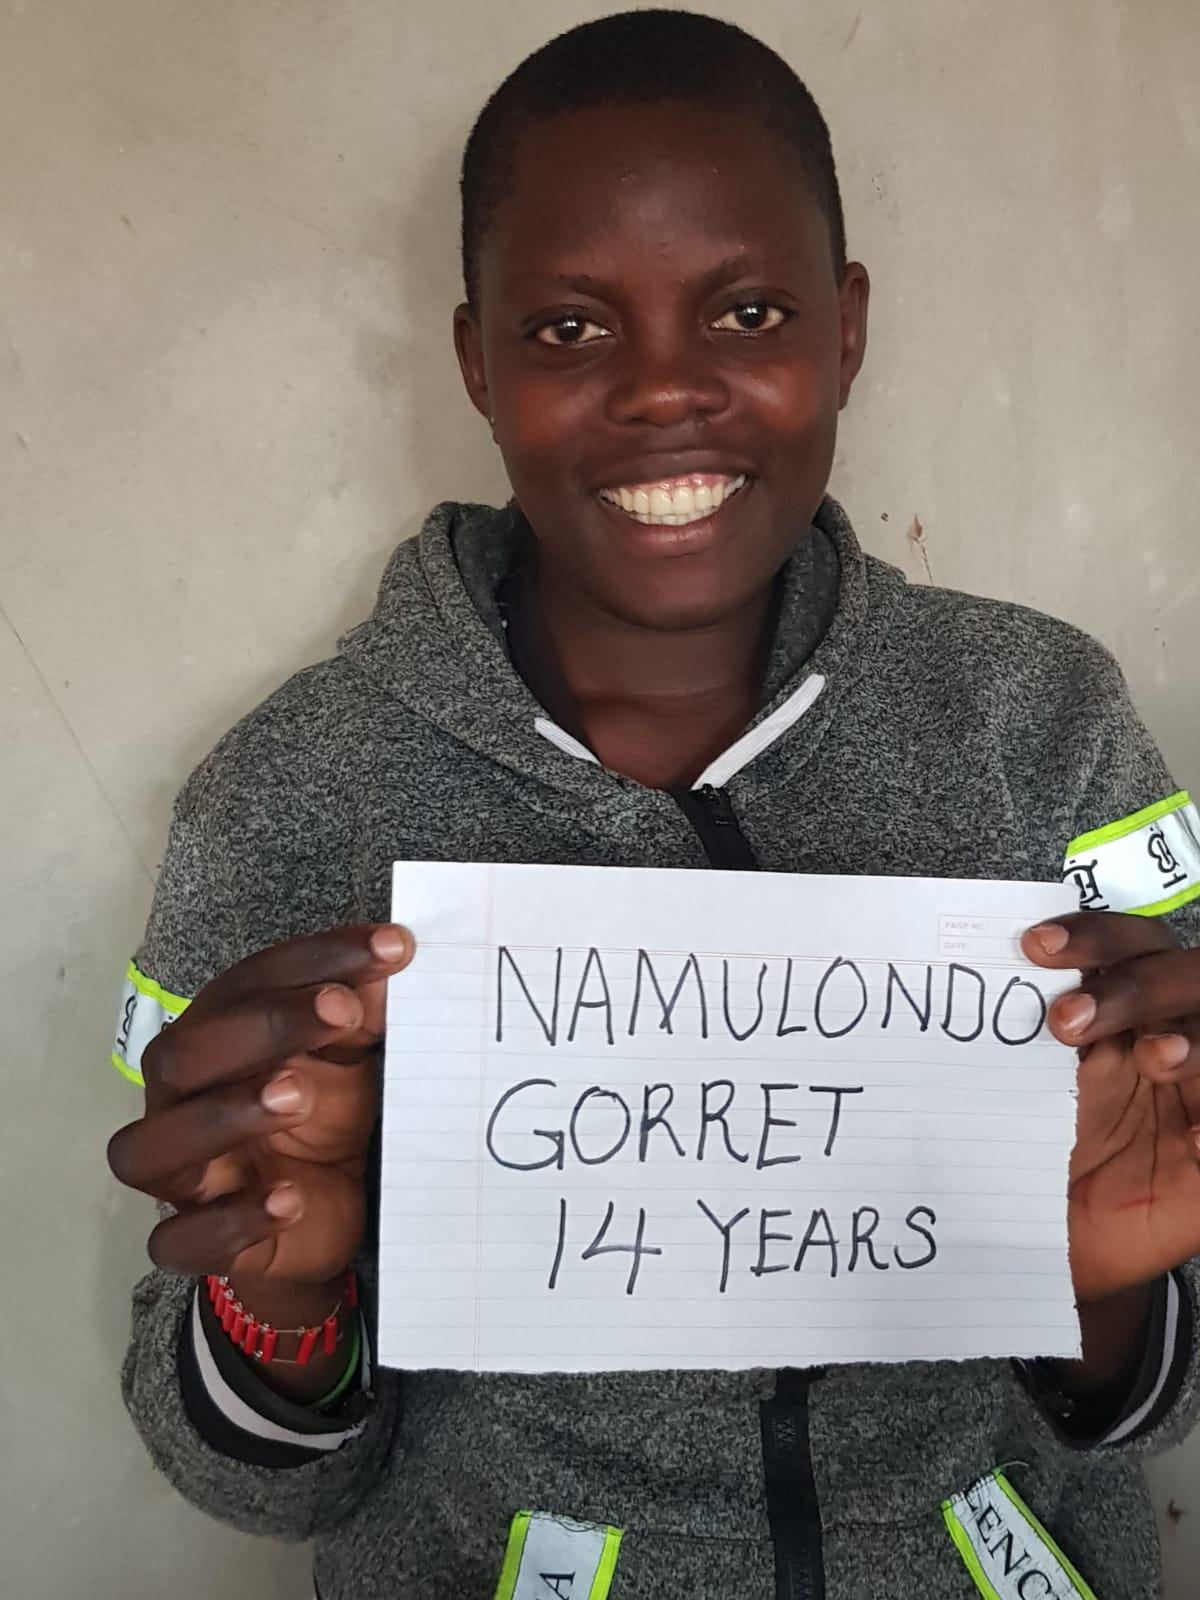 Namulondo,Corret